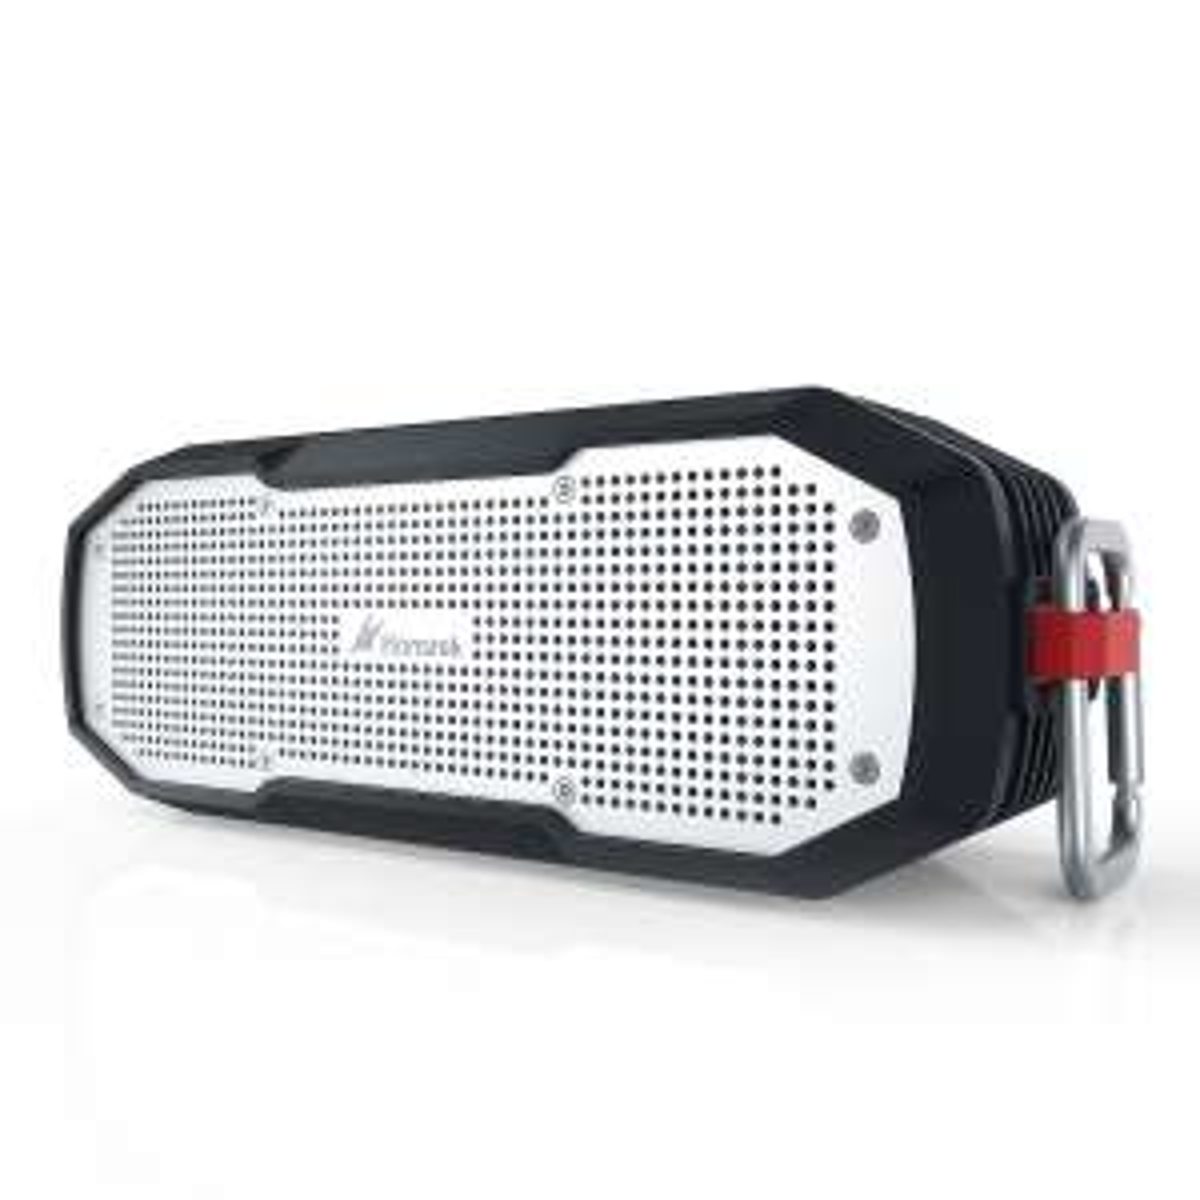 Amazon - Honstek K9 Portable Bluetooth Lautsprecher Kabelloser Bluetooth V 4.2 Lautsprecher 29,99 Euro